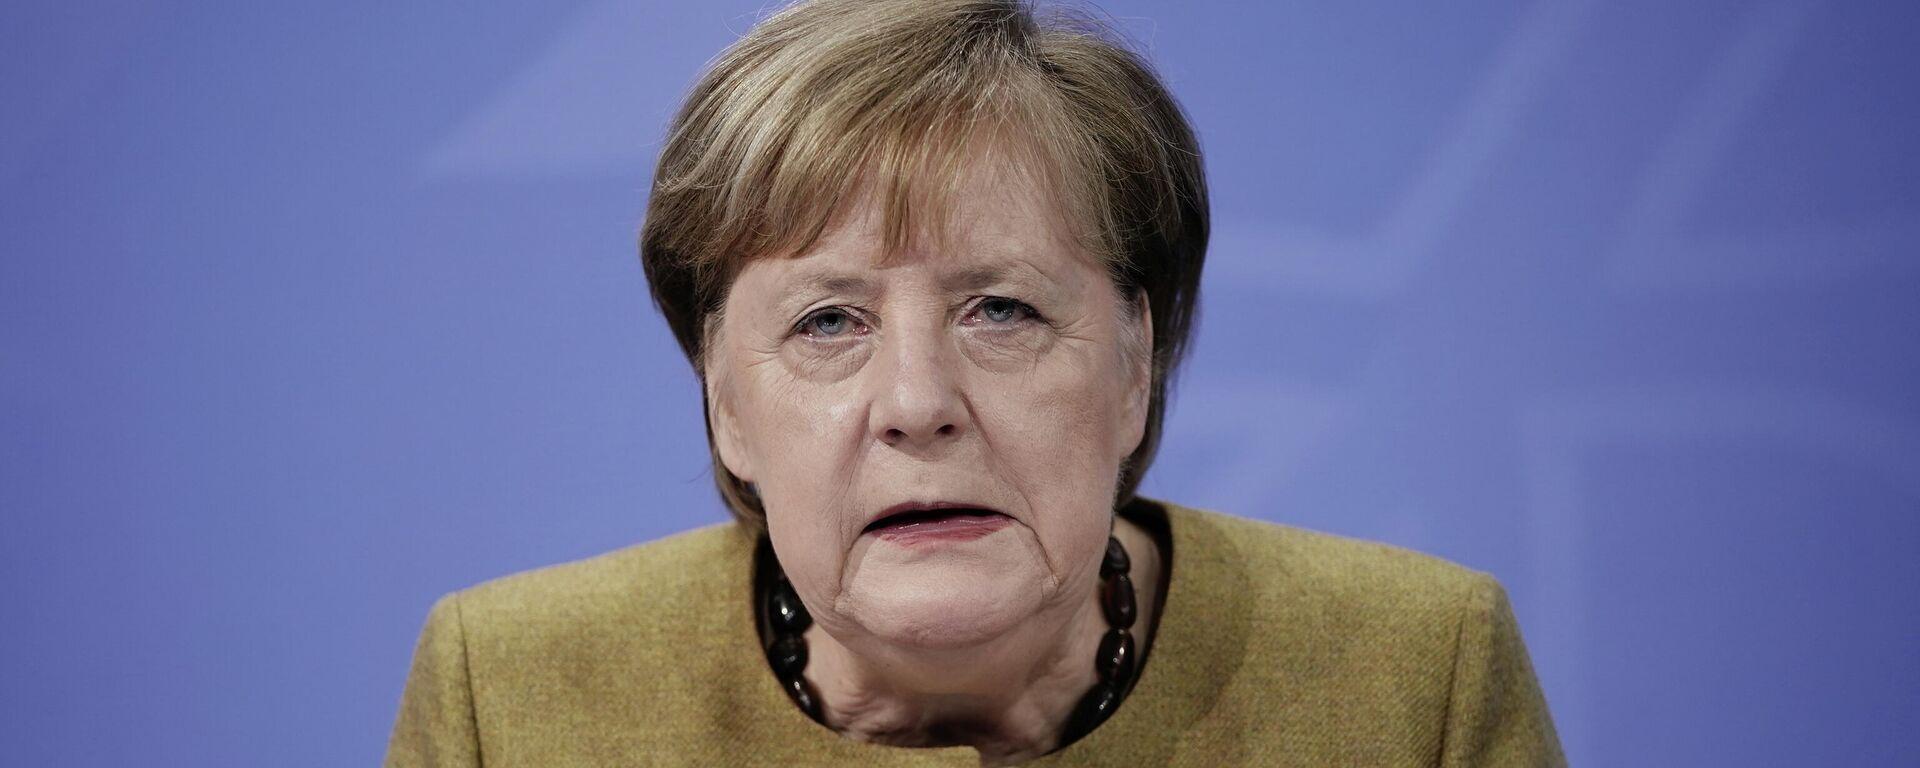 Angela Merkel - SNA, 1920, 21.01.2021